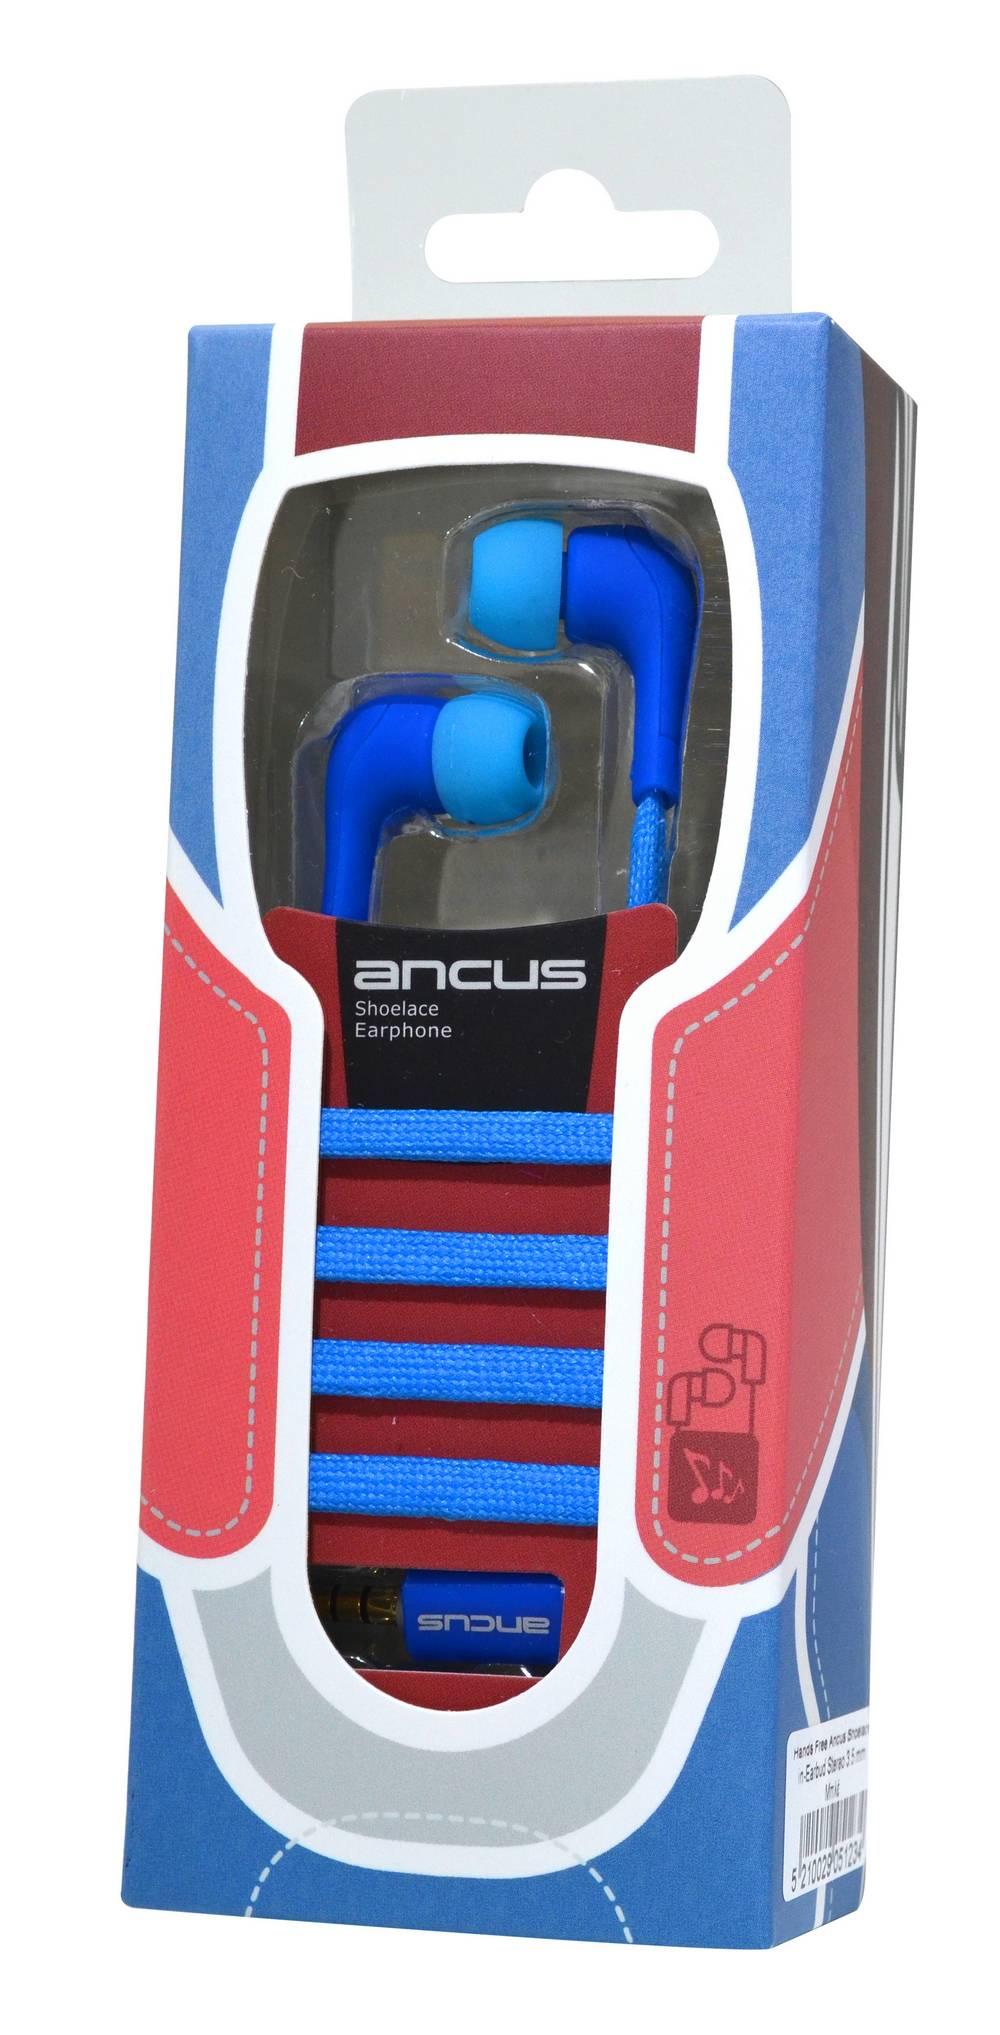 Hands Free Ancus Shoelace in-Earbud Stereo 3.5 mm για Apple-Samsung-Sony-LG-Huawei Μπλέ με Καλώδιο Κορδόνι, Μικρόφωνο, Πλήκτρο Απάντησης